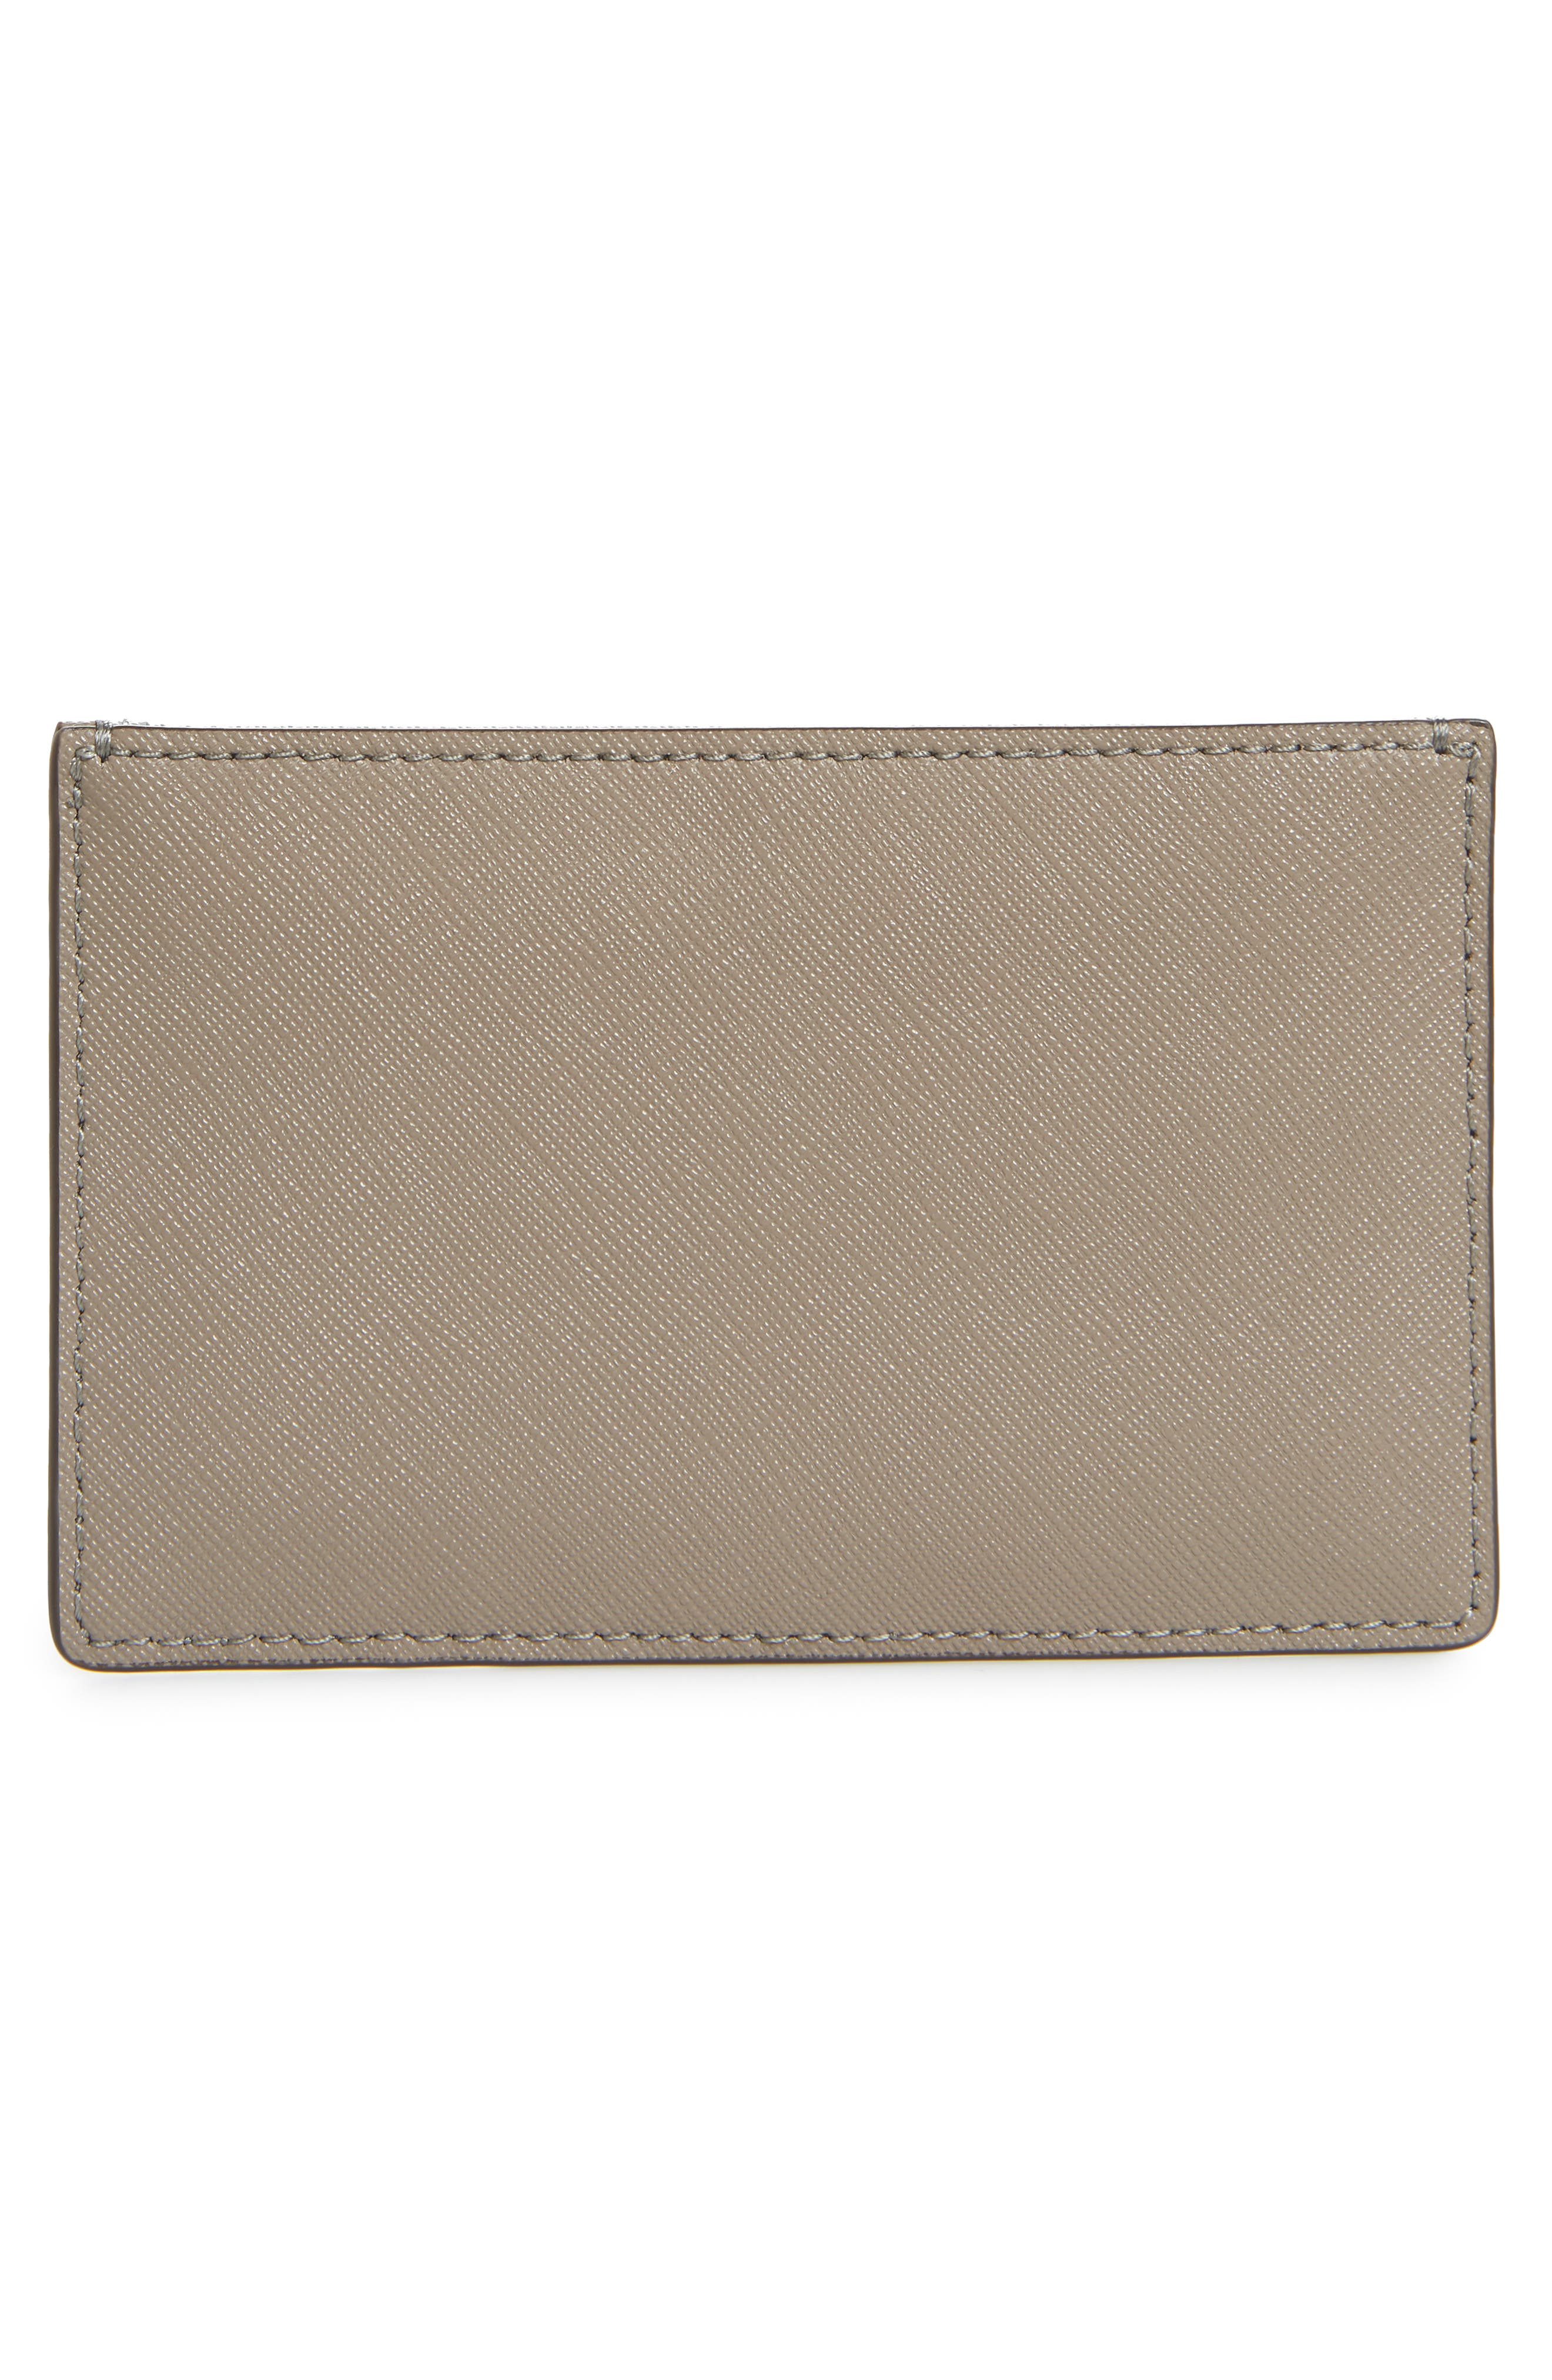 Robinson Leather Card Case,                             Alternate thumbnail 2, color,                             GRAY HERON